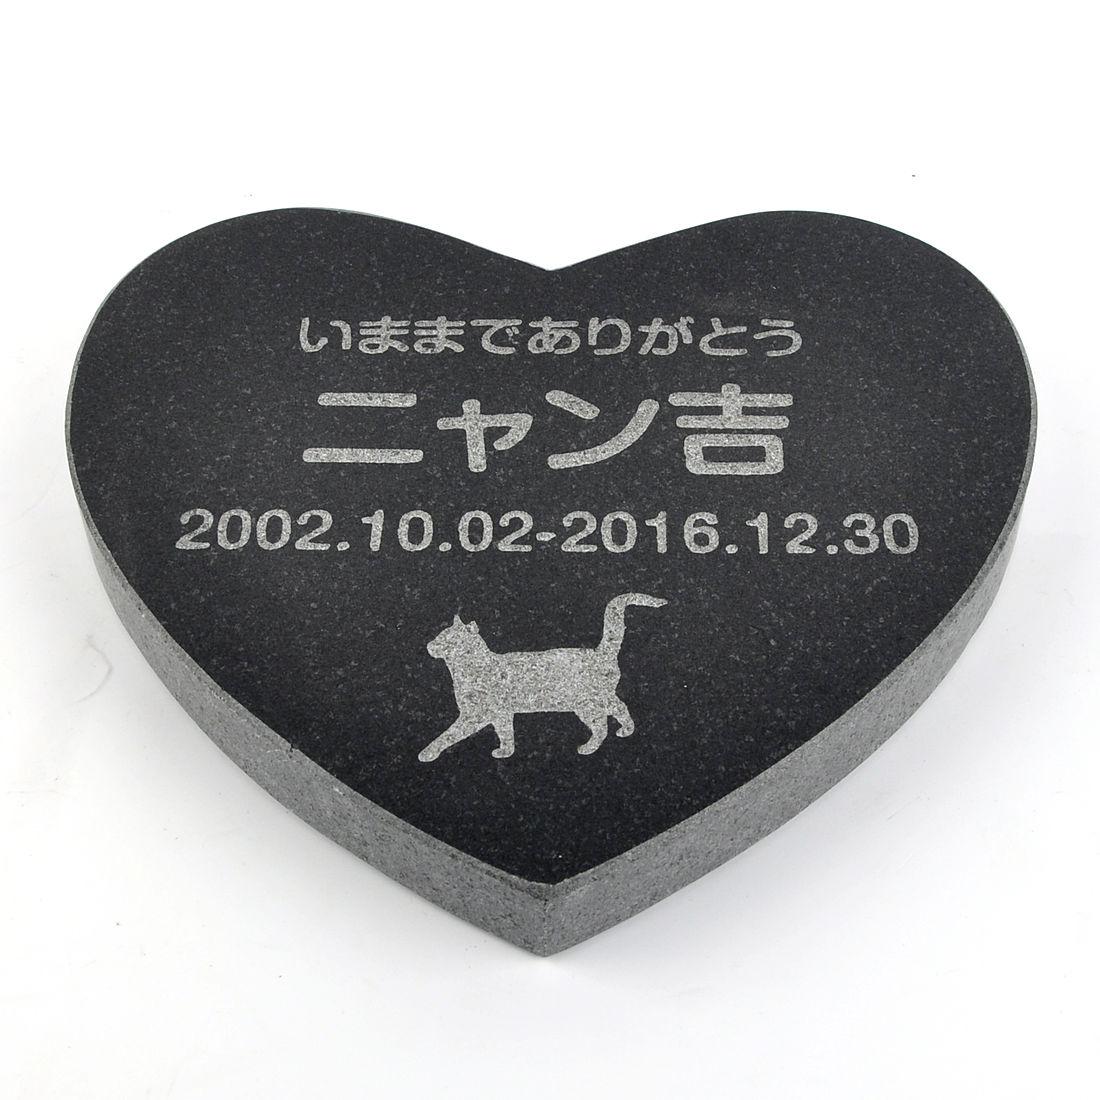 Pet&Love. ペットのお墓 天然石製 シンプル型 御影石 ブラック プレーン ハート 180x160mm(厚さ20mm)  【HLS_DU】【楽ギフ_名入れ】 attr130attr ctgr2ctgr sml3sml+ctgr2ctgr CAT